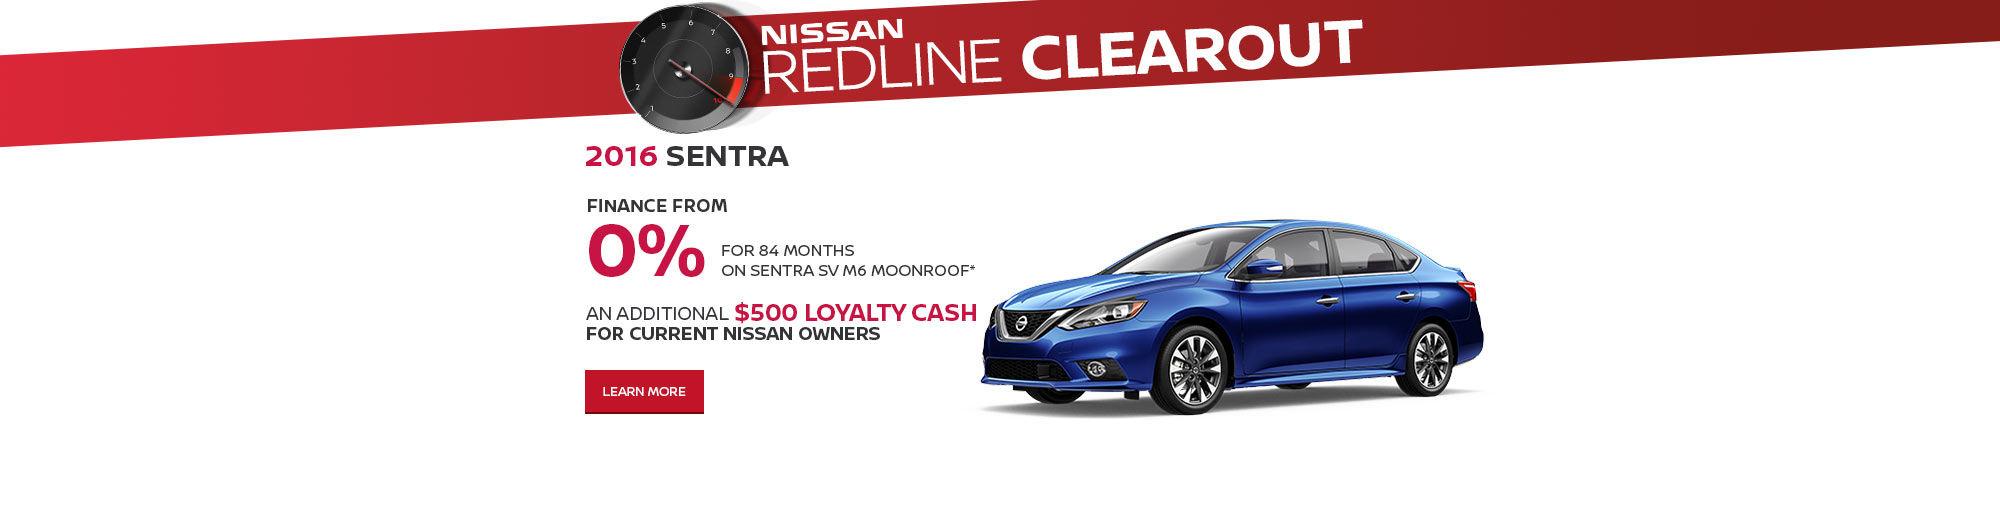 Redline Clearout Promo September-Sentra